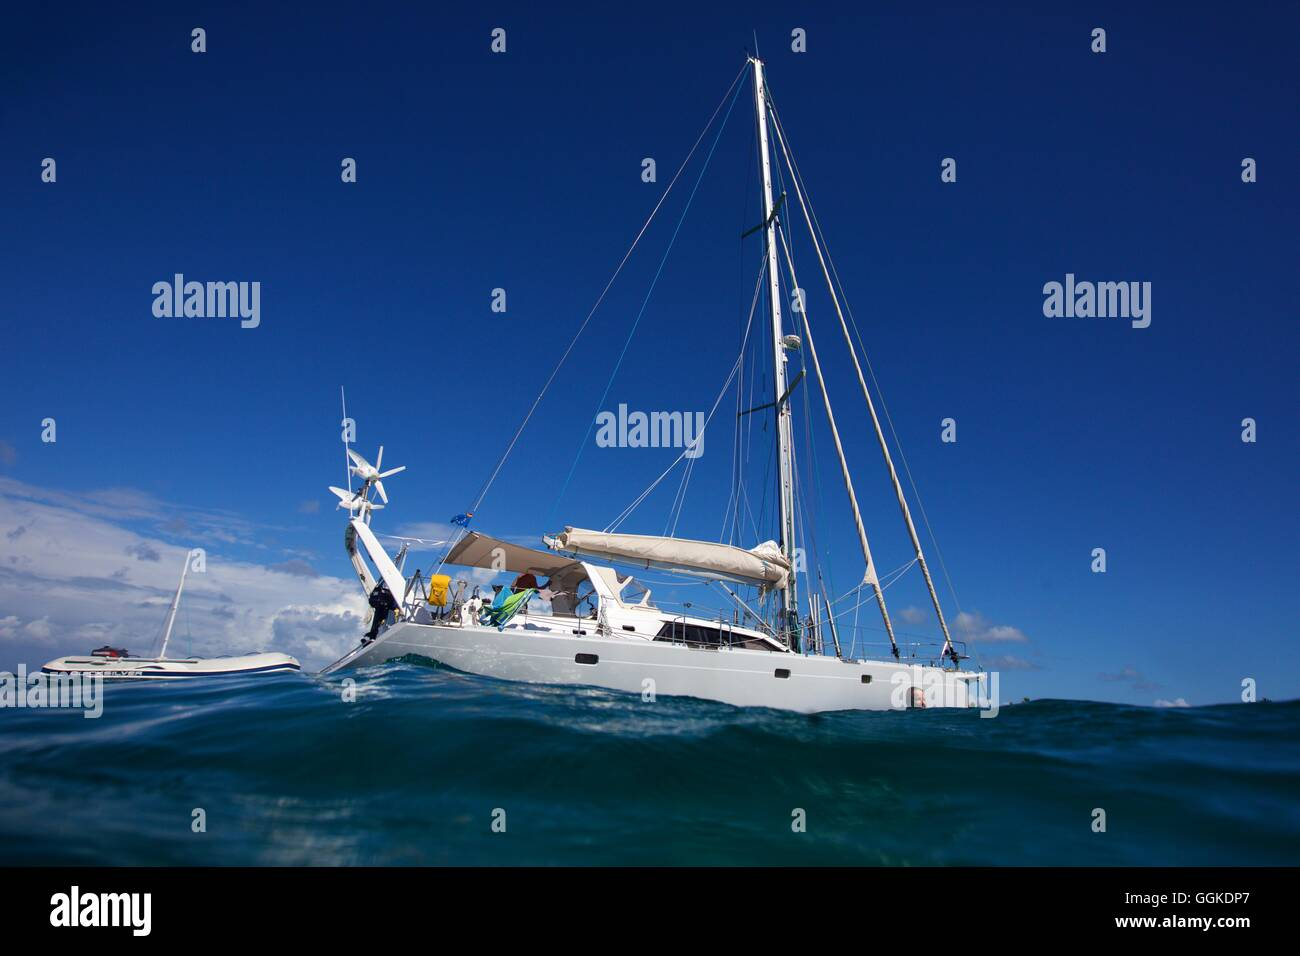 Sailing yacht in the Caribbean Sea Stock Photo